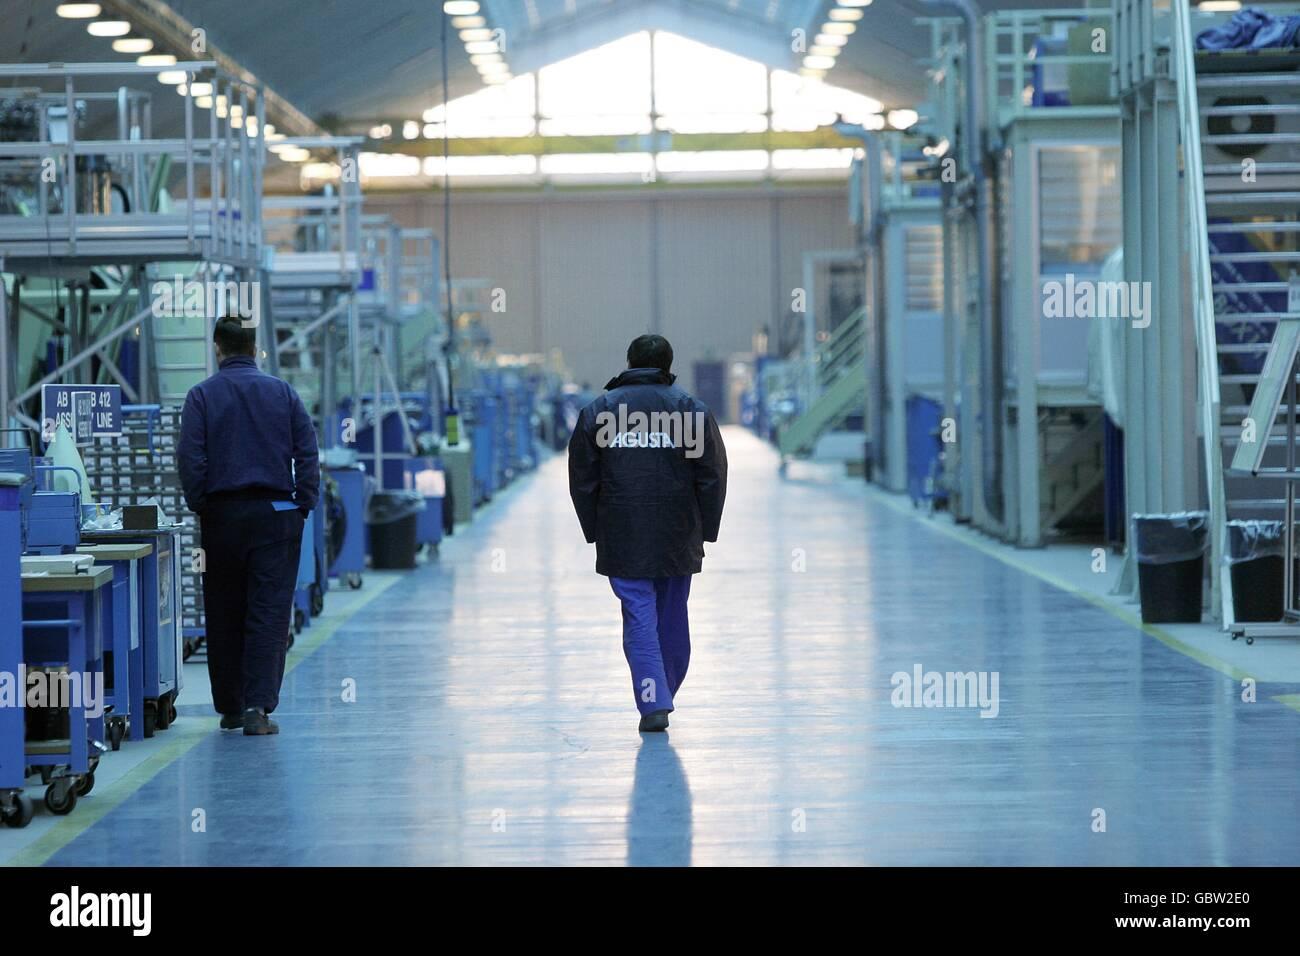 L'industrie aéronautique/Agusta Westland Helicopters - production - Samarate, Varese, Italie © Riccardo Photo Stock